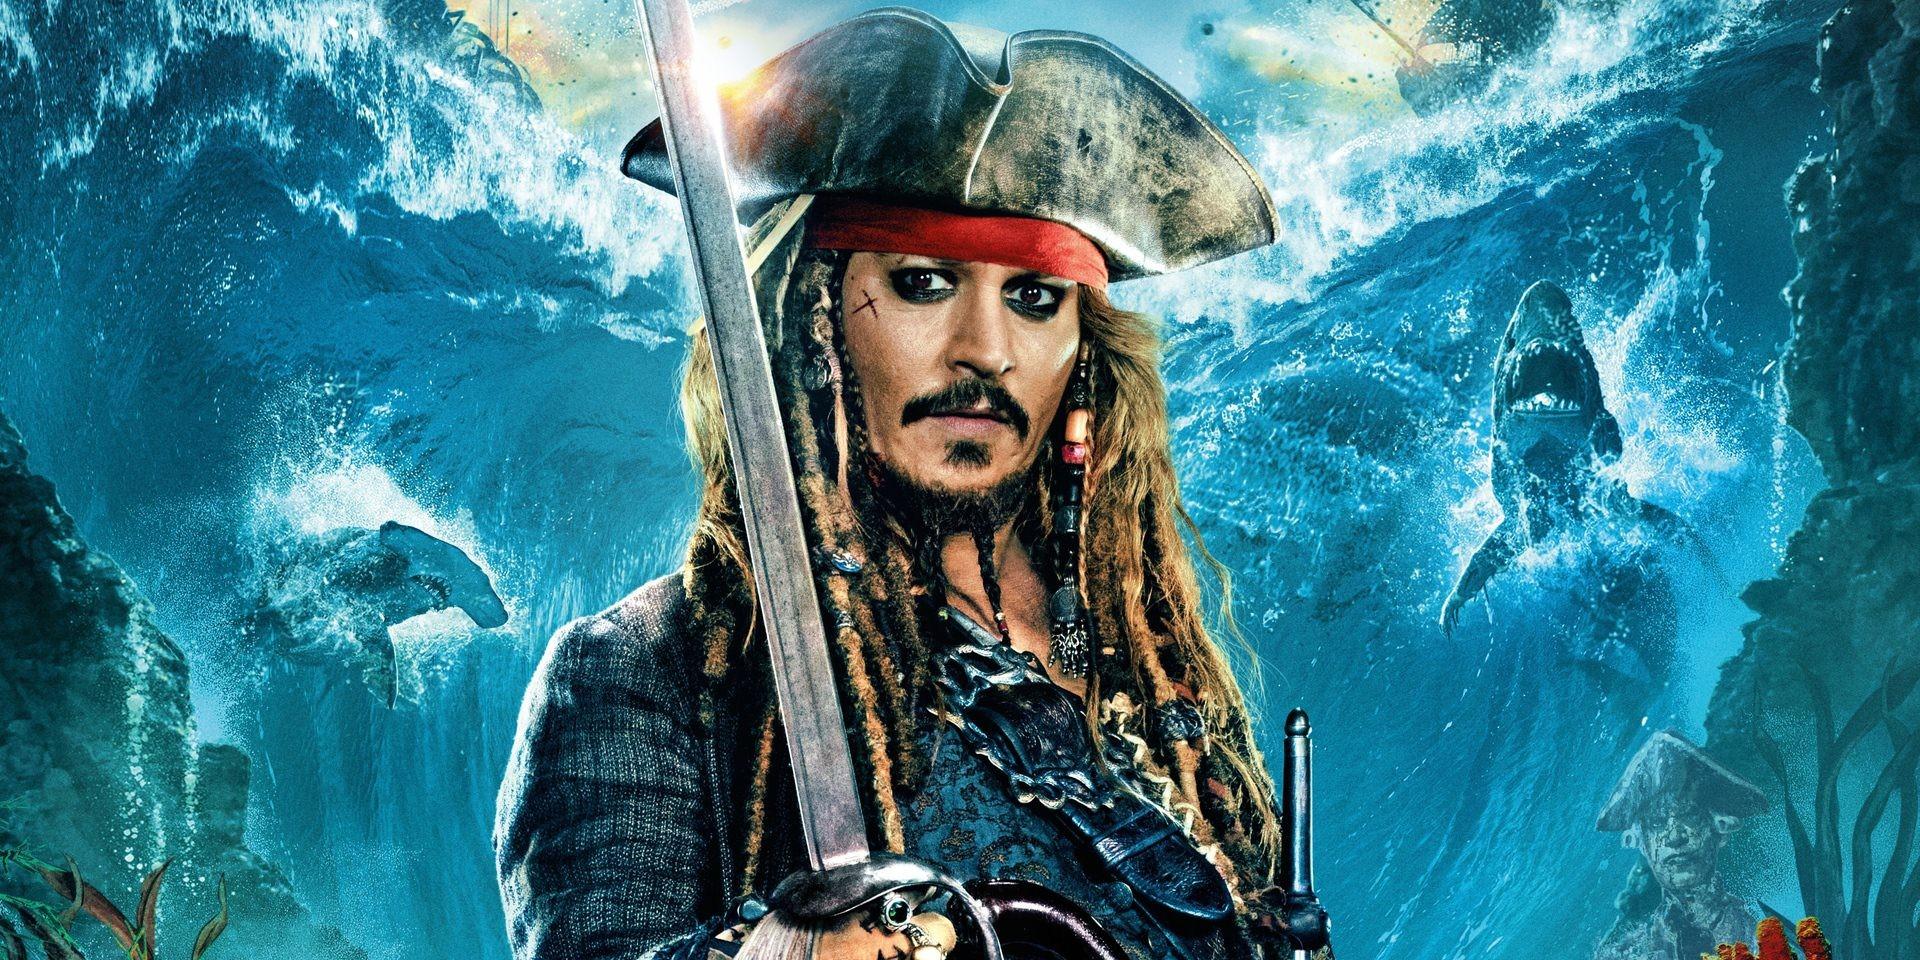 Pirates of the caribbean top 5 Disney blog